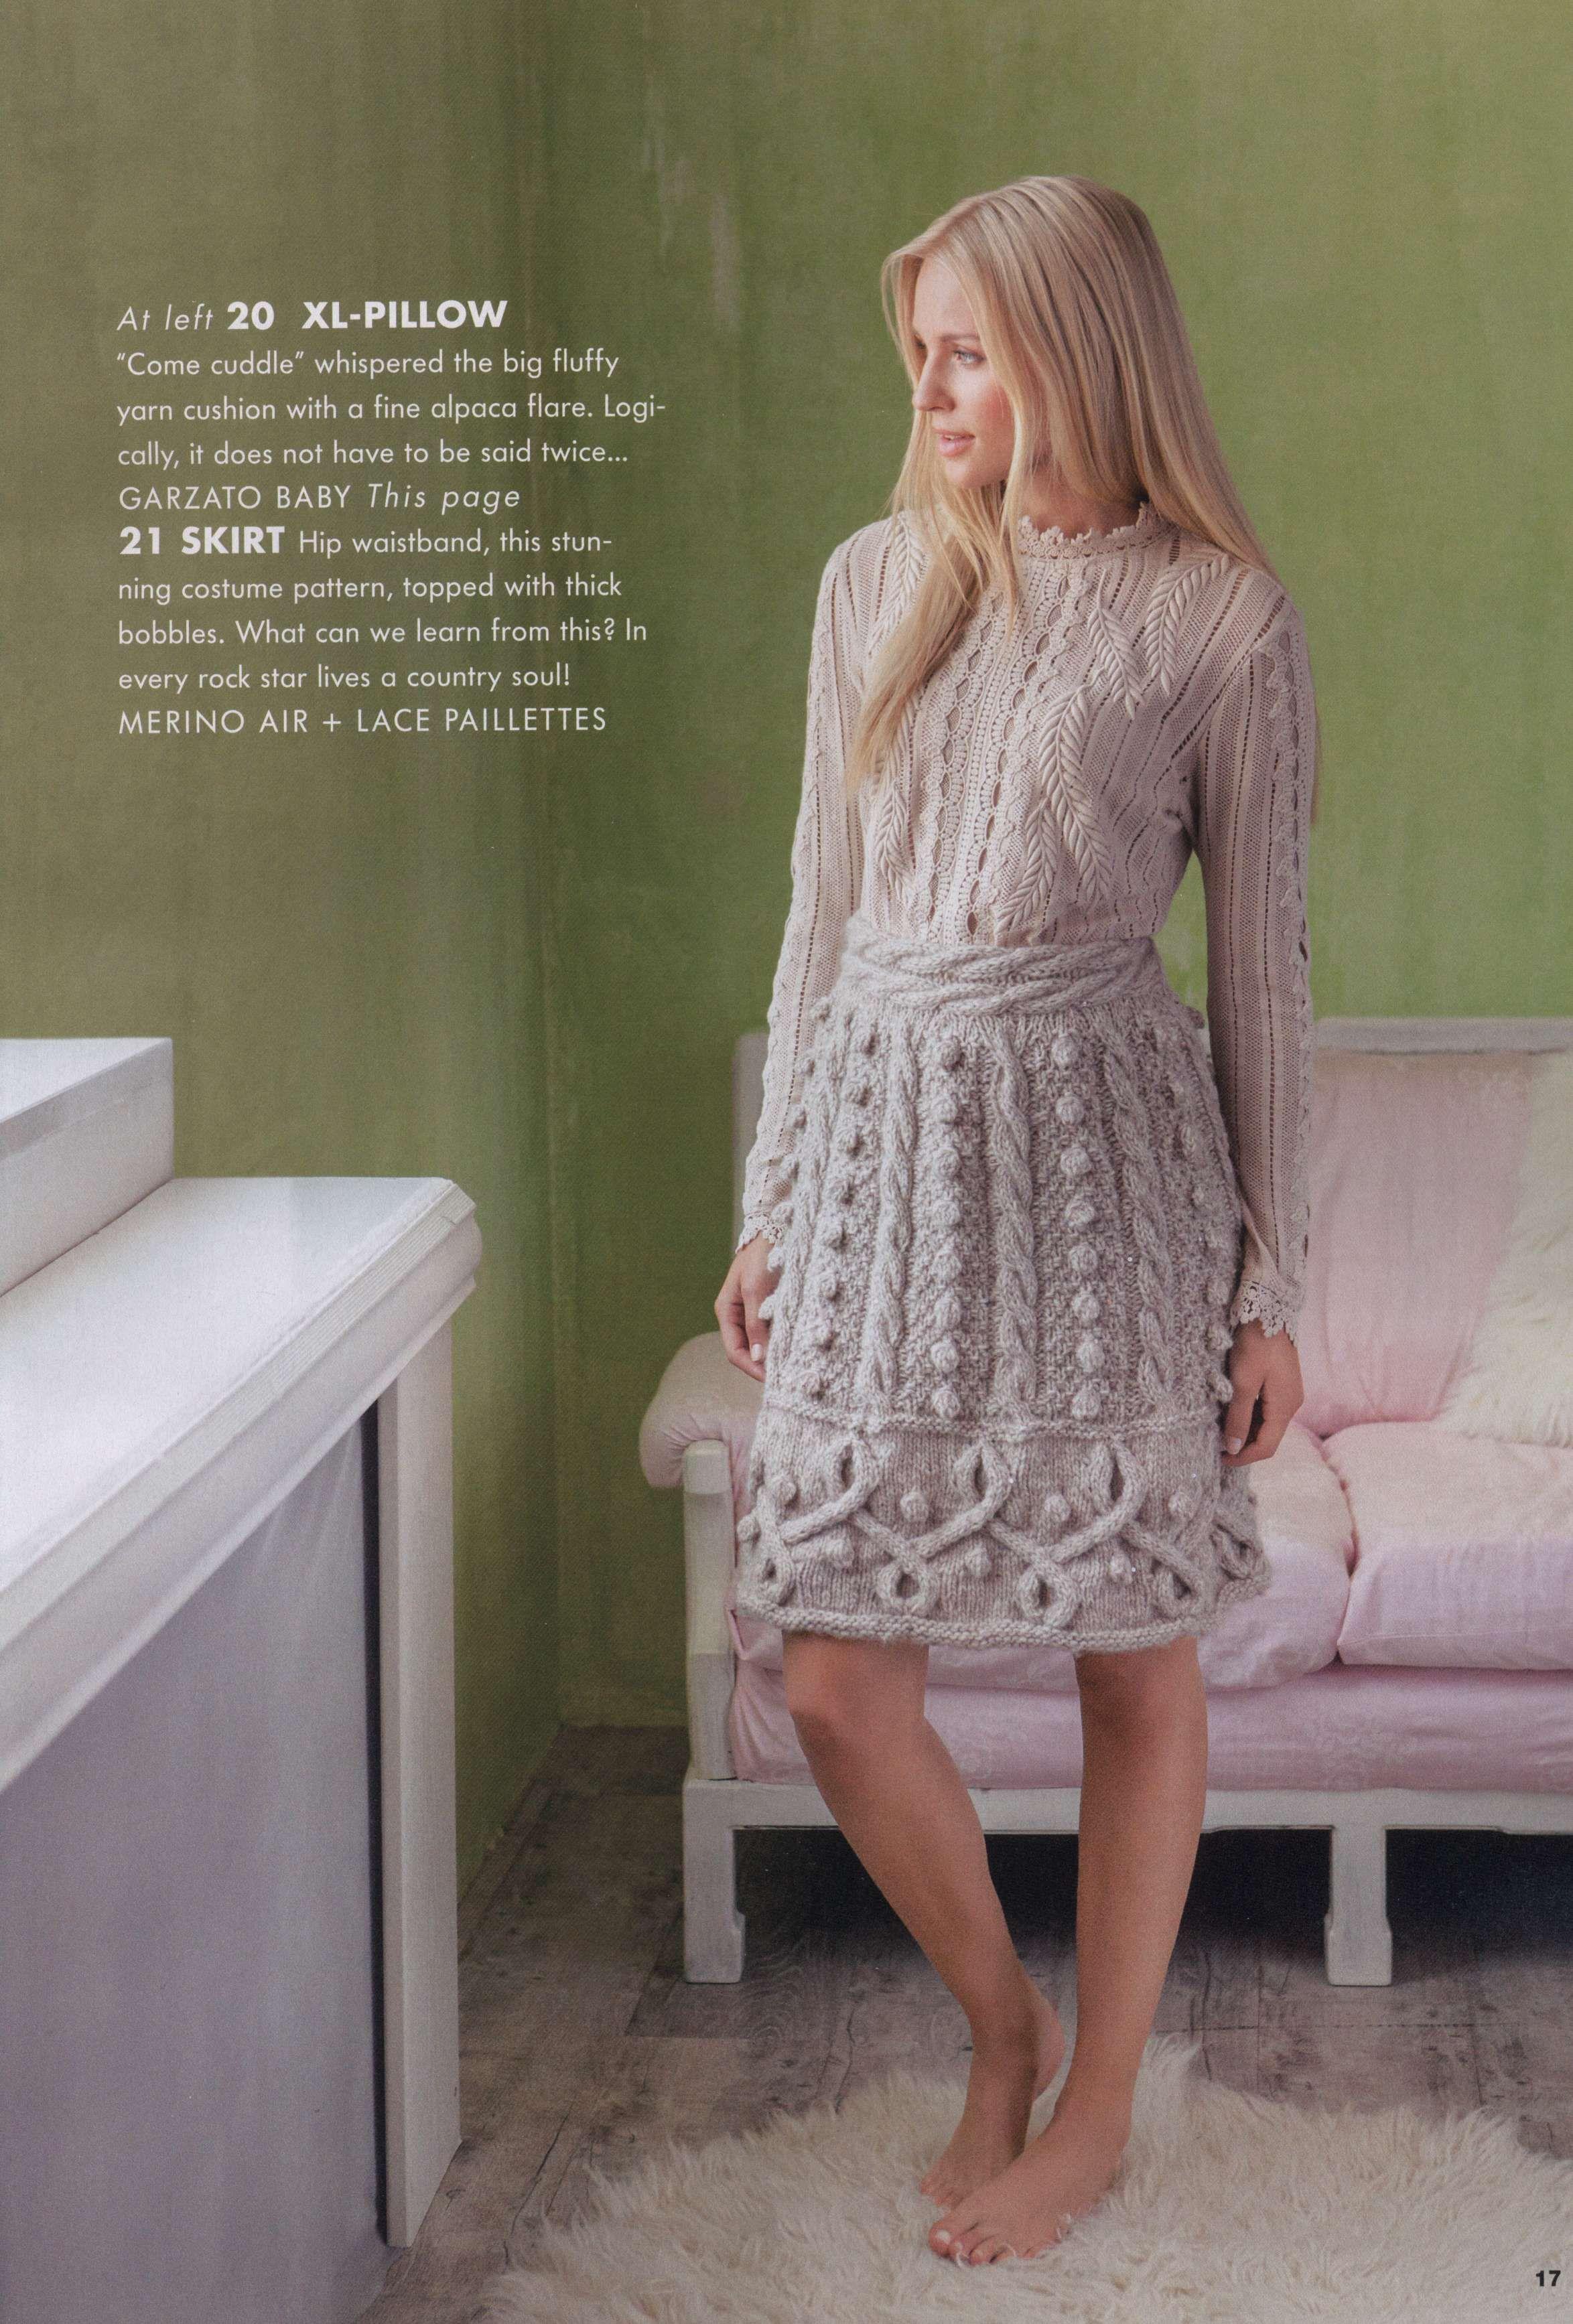 Skirt (hand knit) from magazine: FILATI HANDKNITTING №54 2013 (with diagrams)